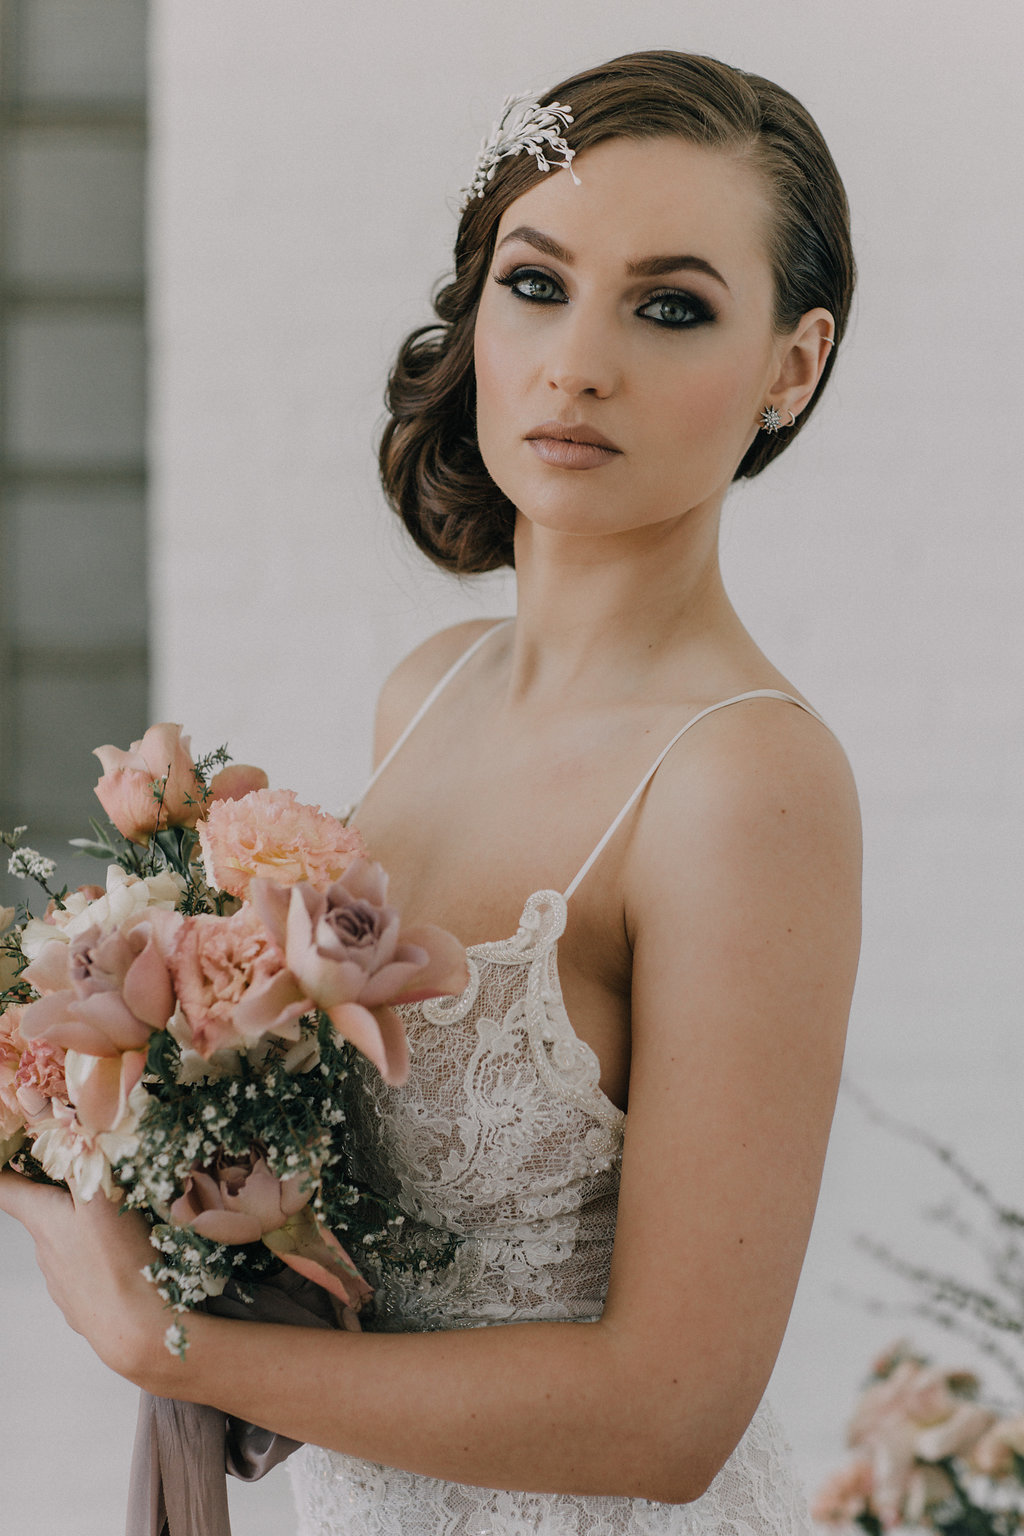 engle-olson-lady-vamp-look-book-jenna-mahr-photography-23.jpg